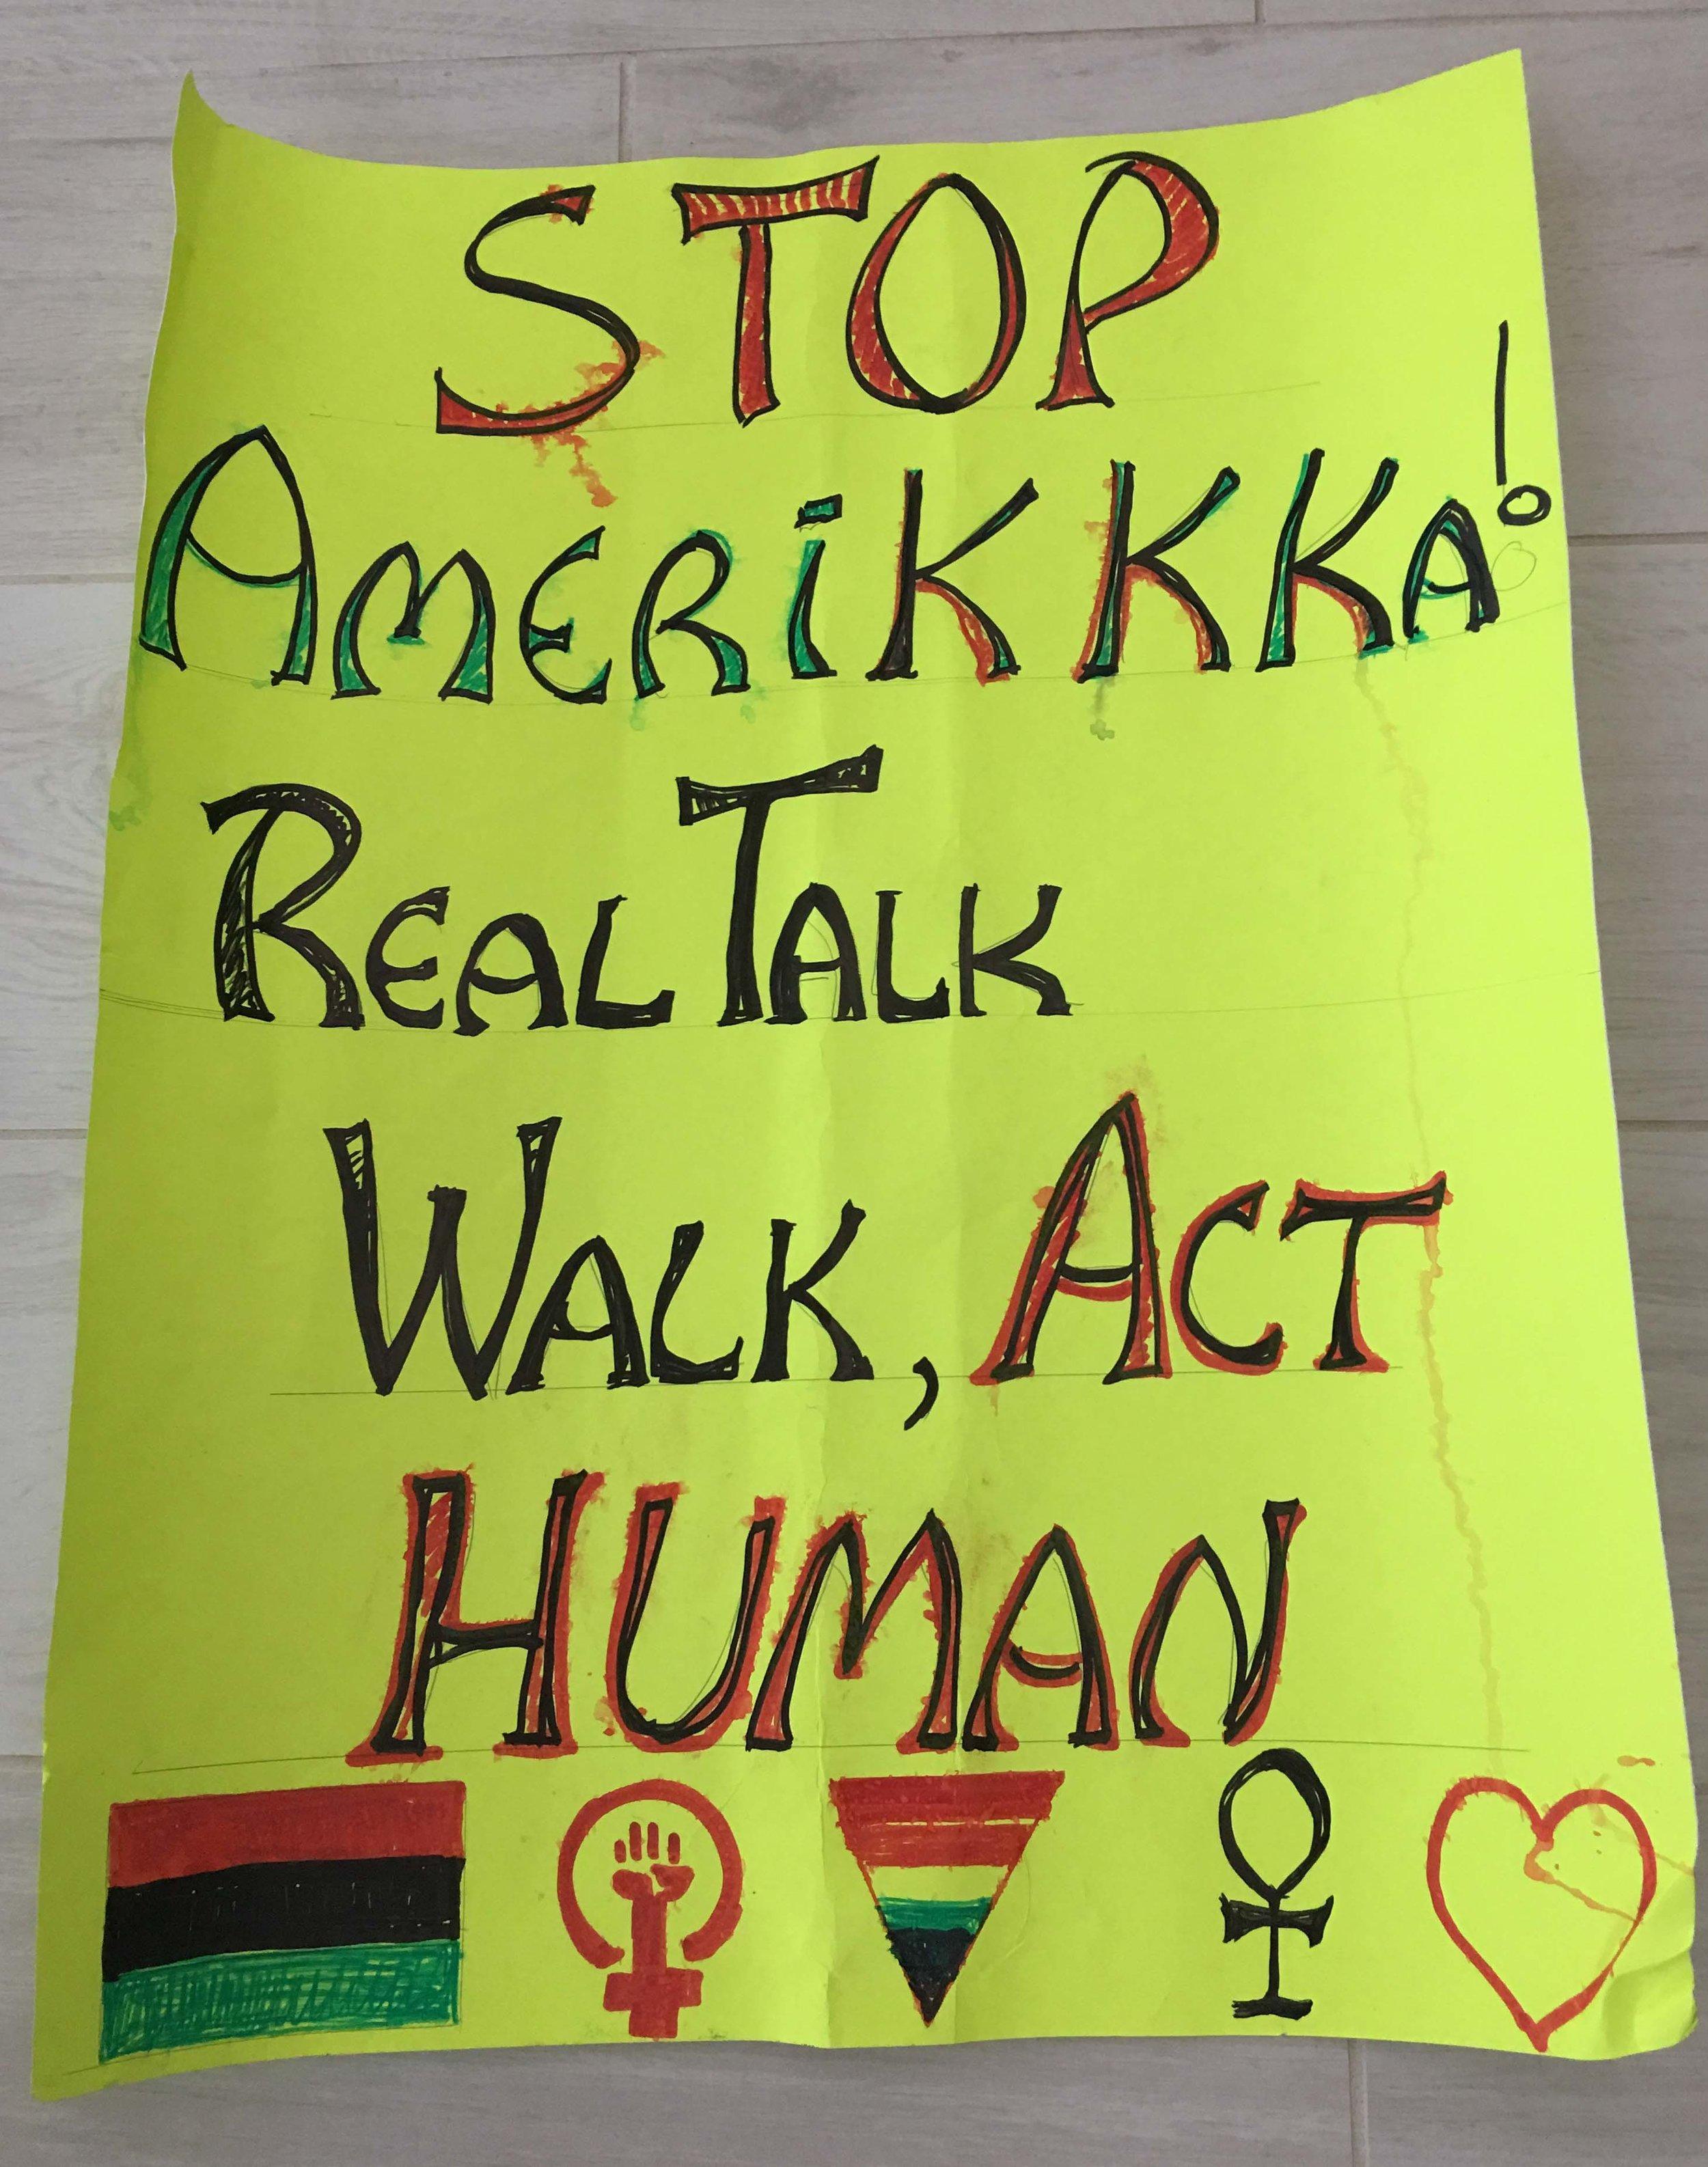 STOP AmeriKKKa!  Real Talk Walk, Act Human